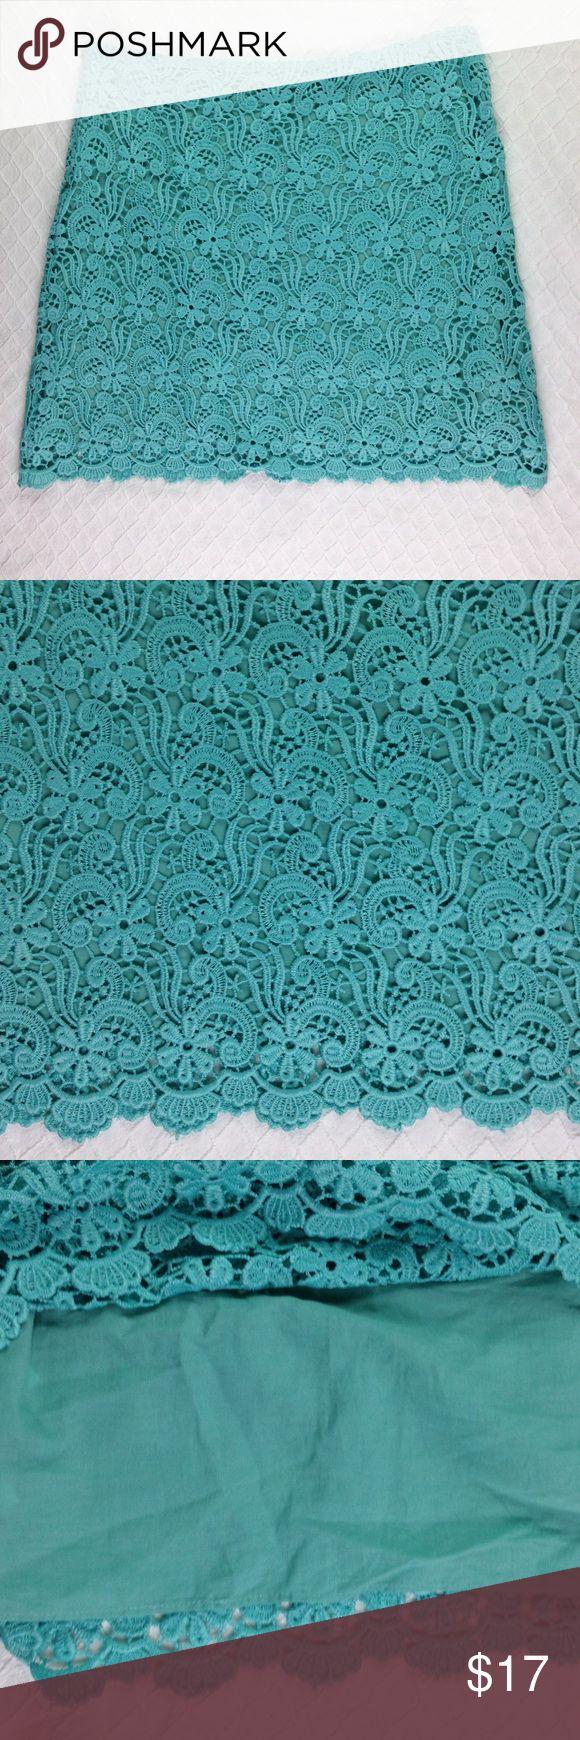 "Zara Crochet Overlay Lined Mint Green Skirt Medium Zara Woman Crochet Overlay Lined Mint Green Above the Knee Skirt   Size Medium  Outershell: 100% Polyester Lining: 100% Cotton  Measurements:  Waist: 31"" Length: 17""  (Inventory A30) Zara Skirts"